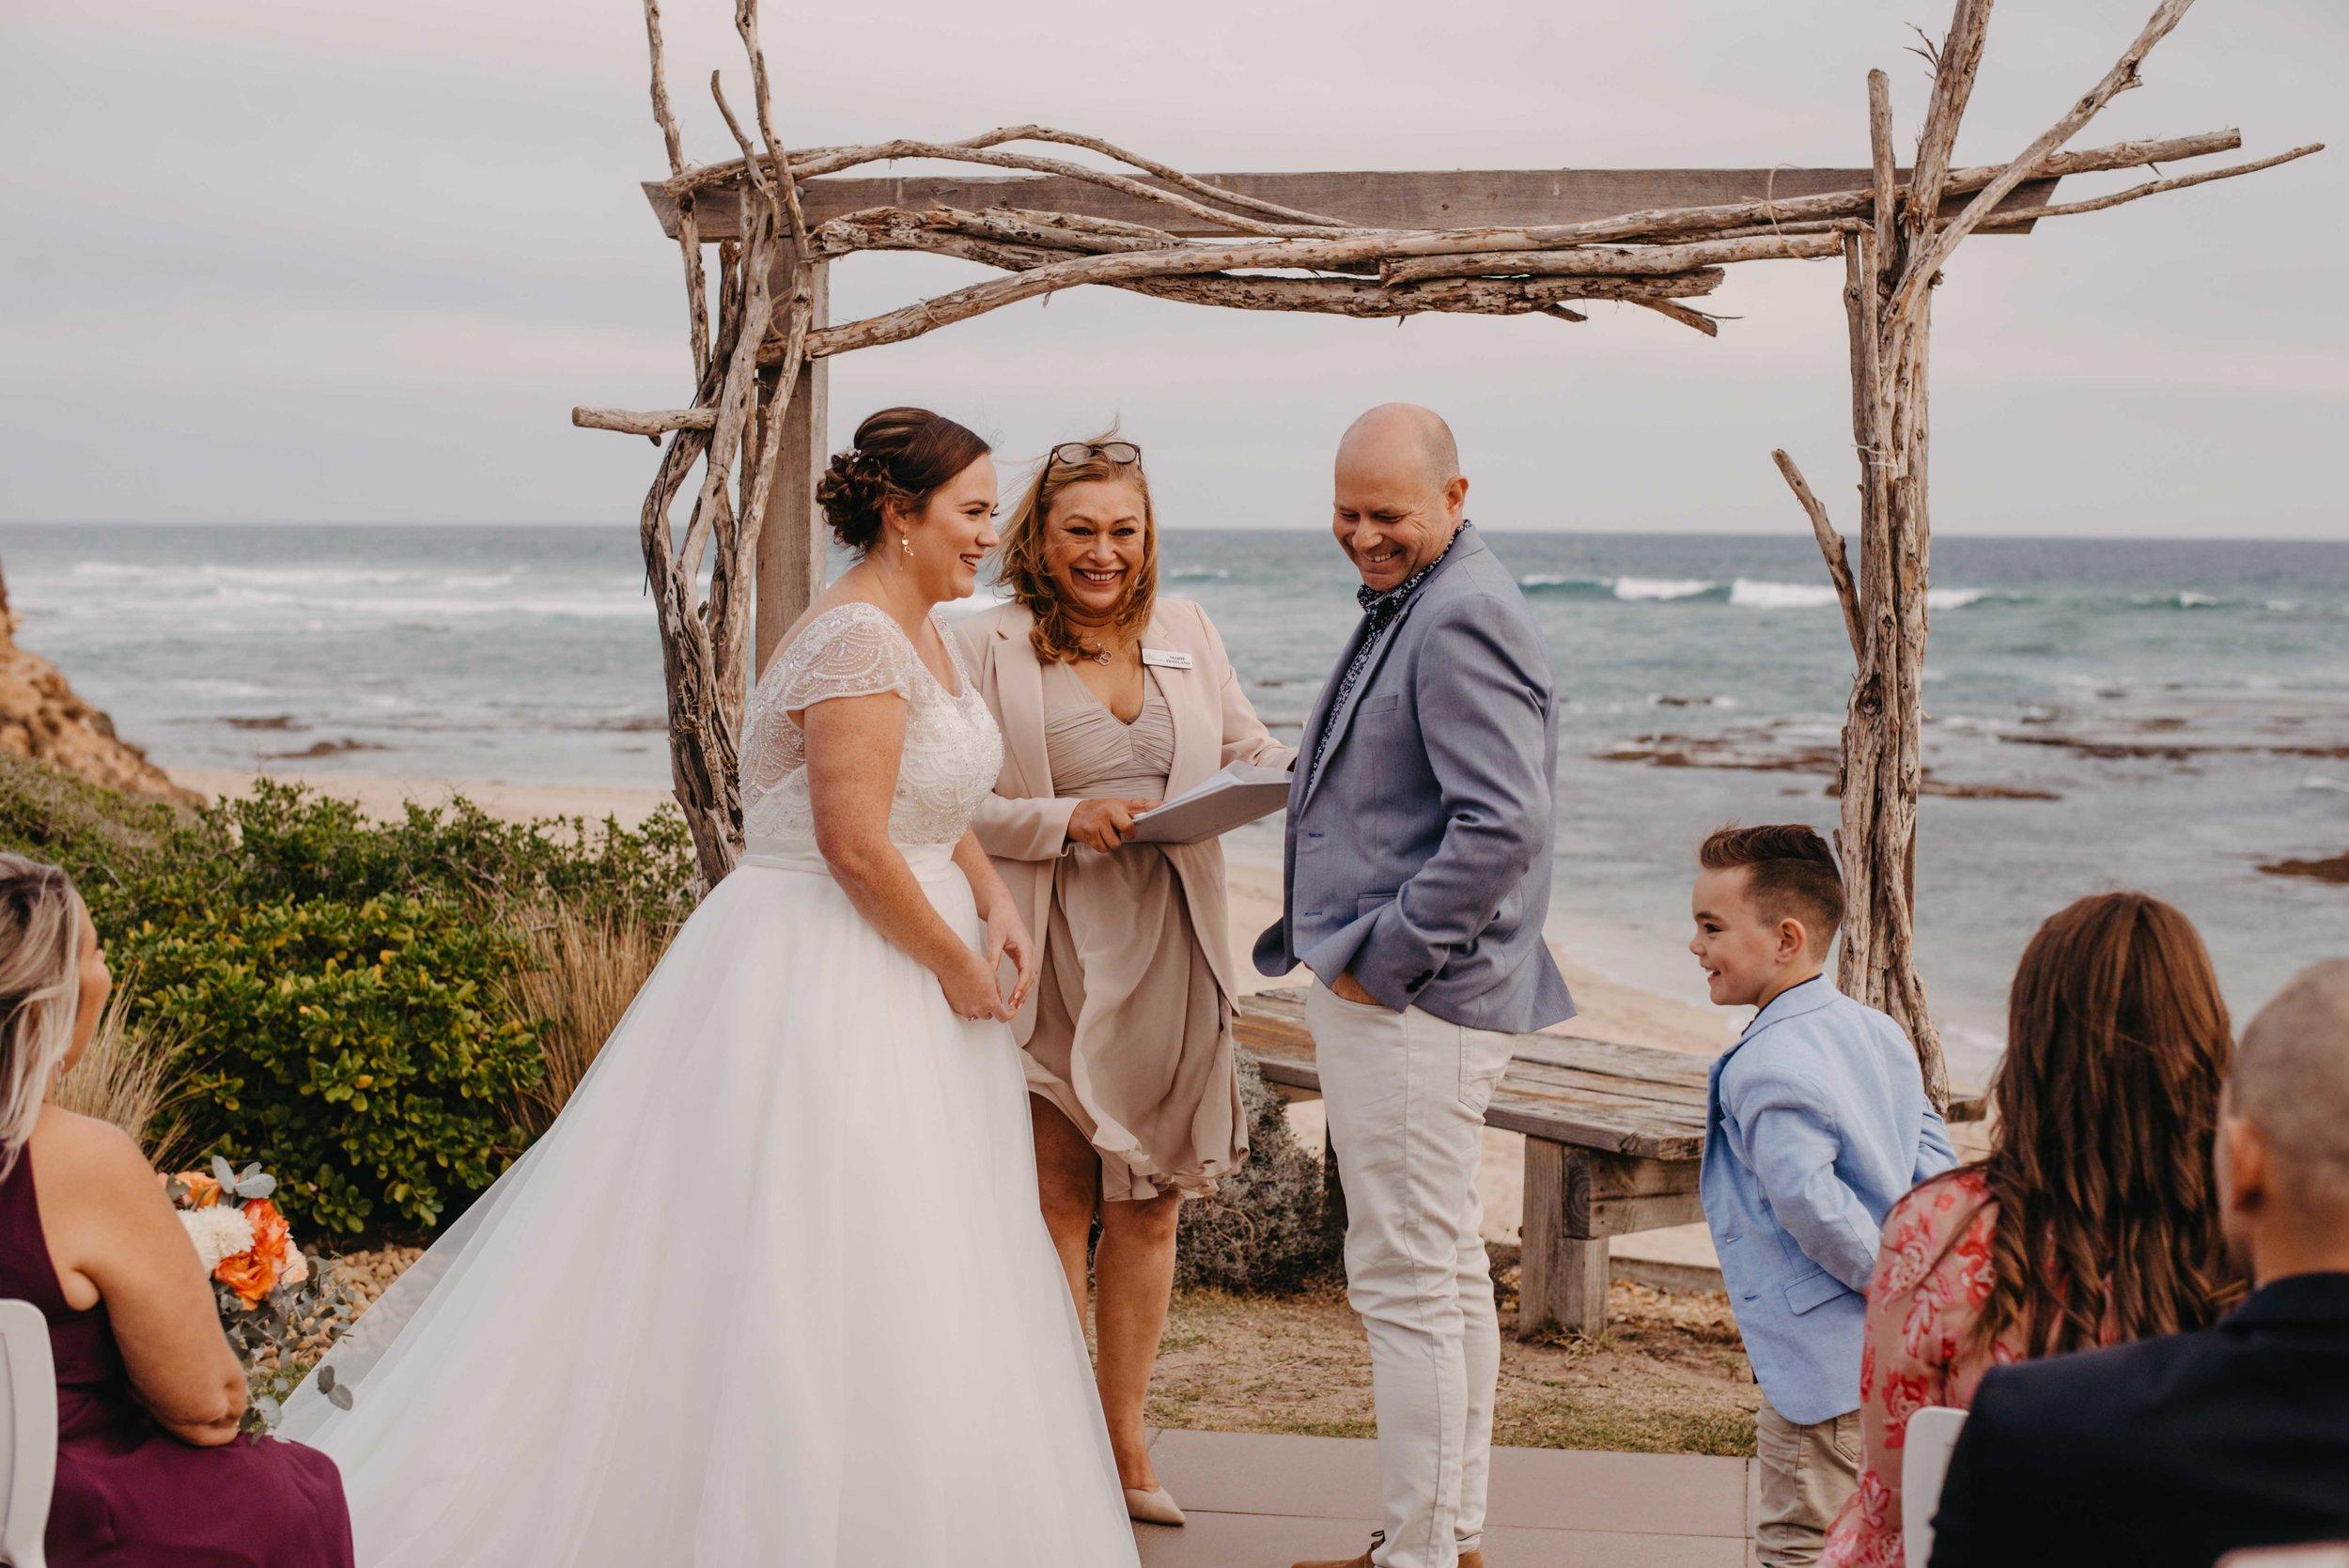 All-Smiles-Sorrento-Wedding-photography-sorrento-wedding-marissa-jade-photography-51.jpg